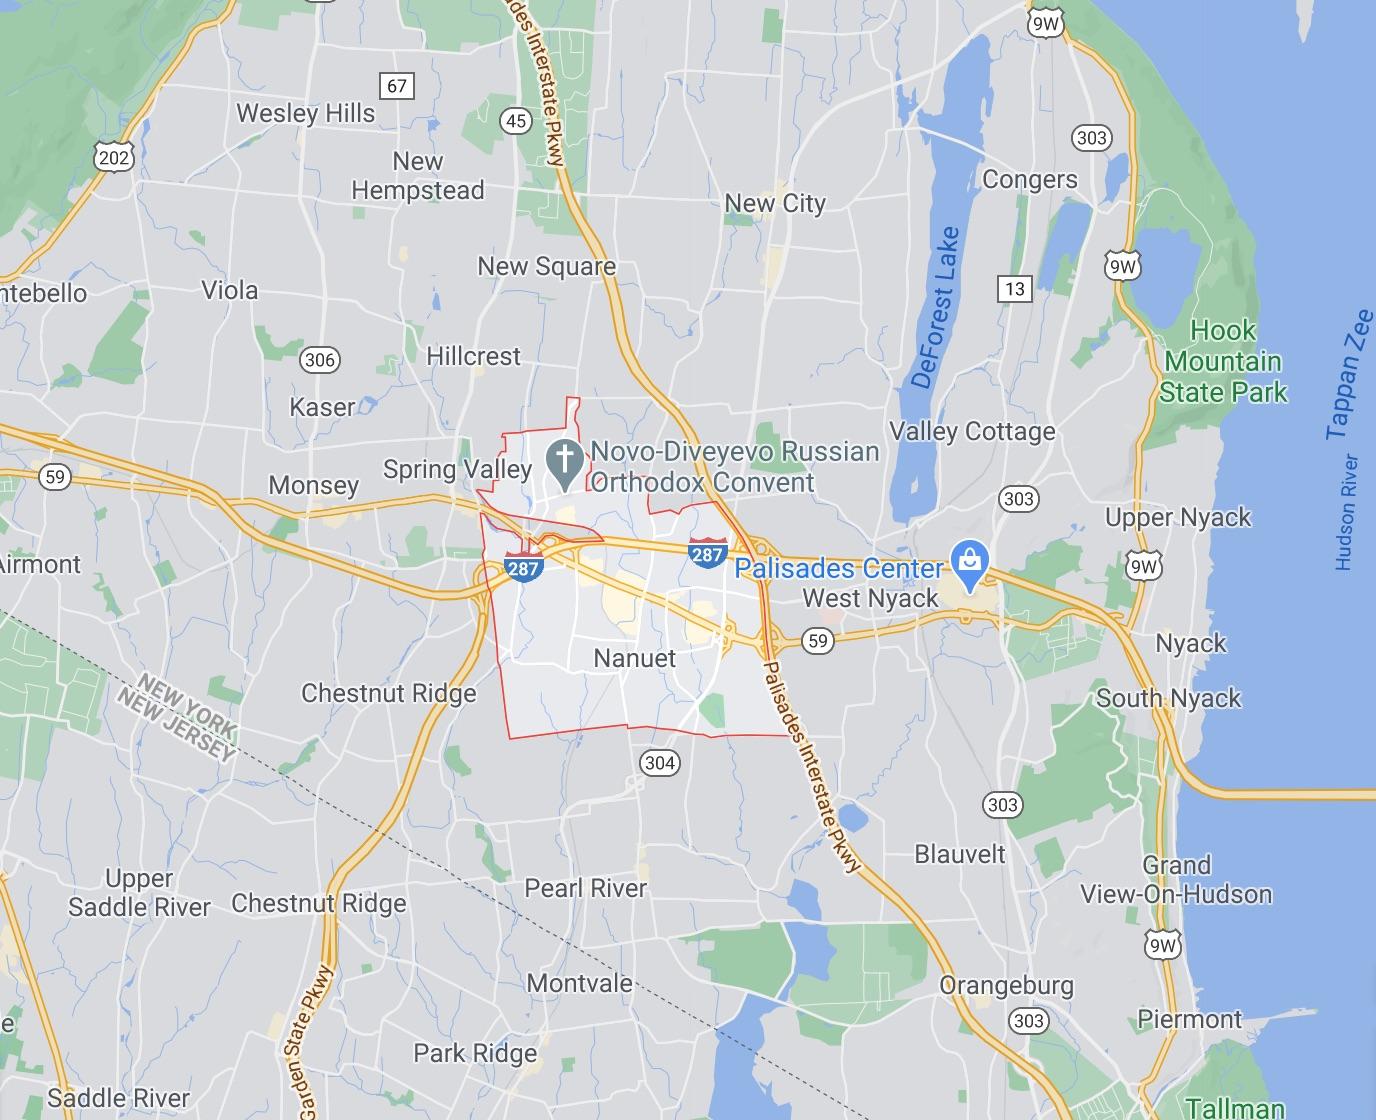 near, Nanuet, NY, New York, long, Island, longisland, pet, store, petstore